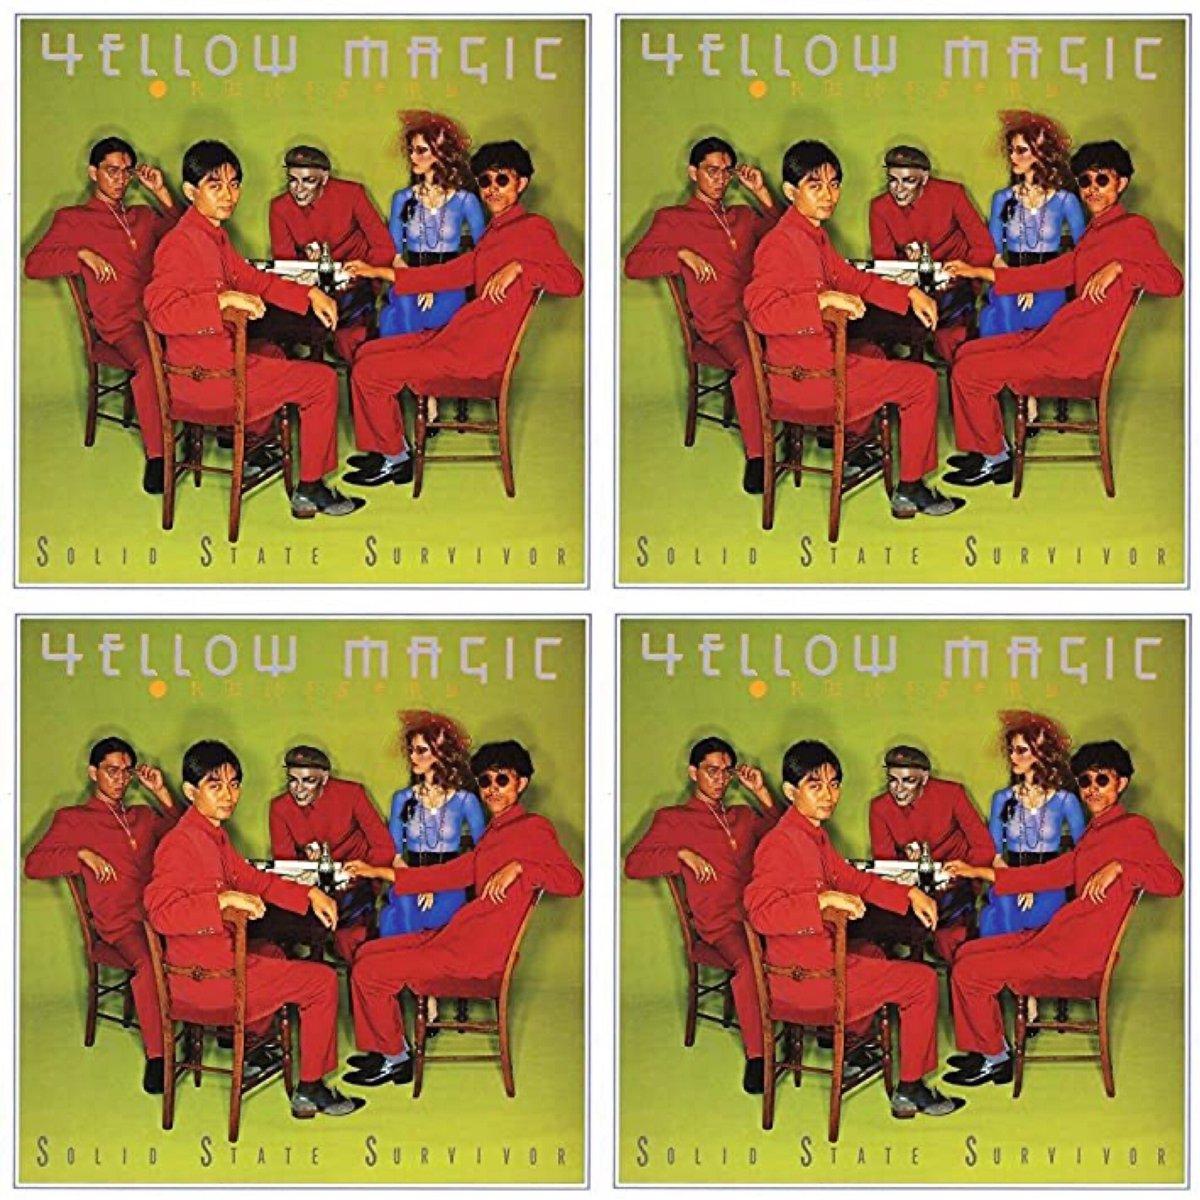 "【Yellow Magic Orchestra】 1979年 41年前の今日発売  初めて聞いた時の衝撃…  ""SOLID STATE SURVIVOR""  ""ソリッドステイトサヴァイヴァー"" https://t.co/jd8gxgckh8  ""テクノポリス"" https://t.co/nUqXaEfOAq  ""ライディーン"" https://t.co/4QrZmeuaYn  #YMO #細野晴臣 #高橋幸宏 #坂本龍一 https://t.co/aJlu93TMOf"